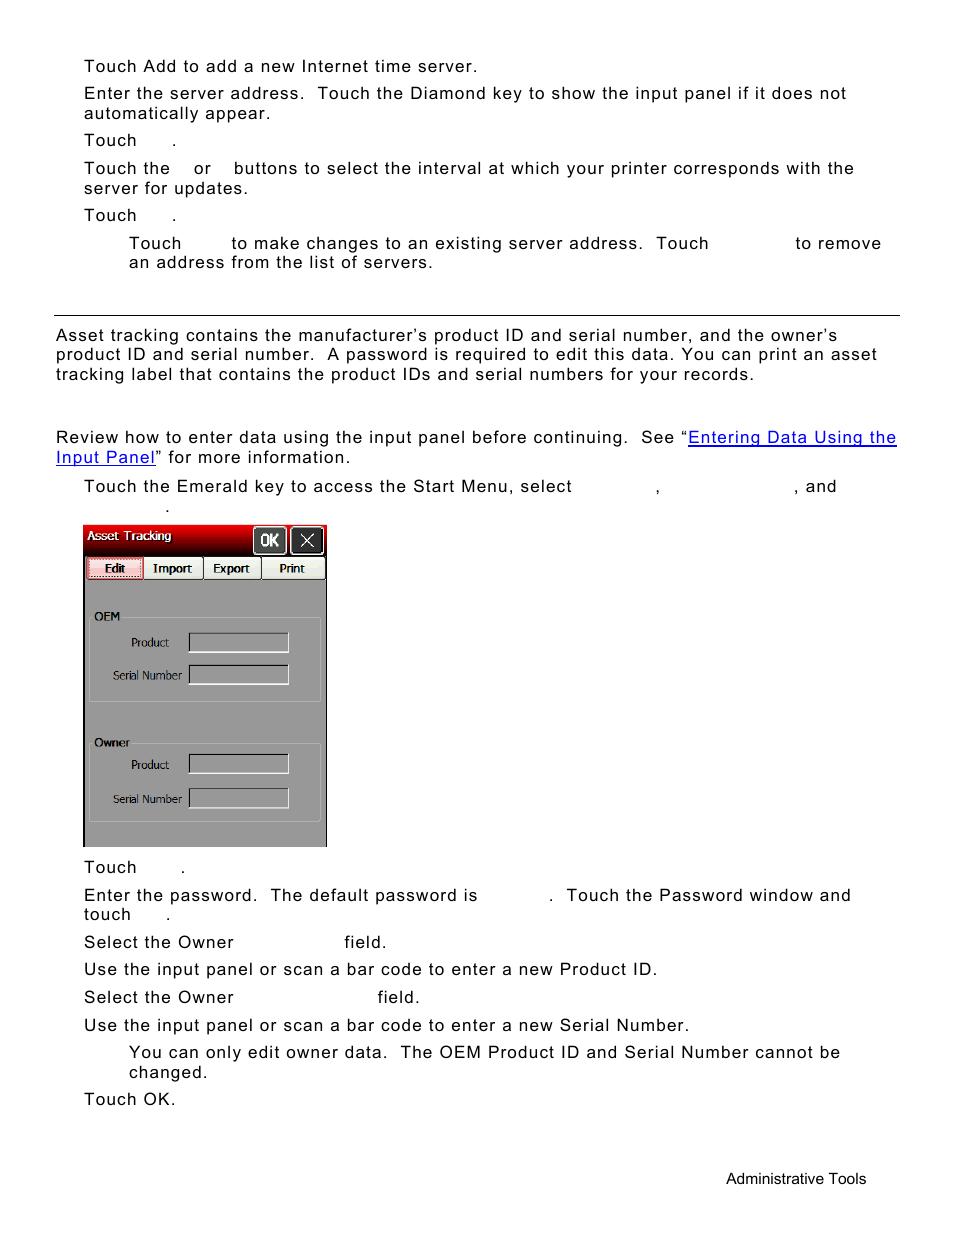 using asset tracking editing owner data using asset tracking 3 rh manualsdir com User Manual Car Owners Manual